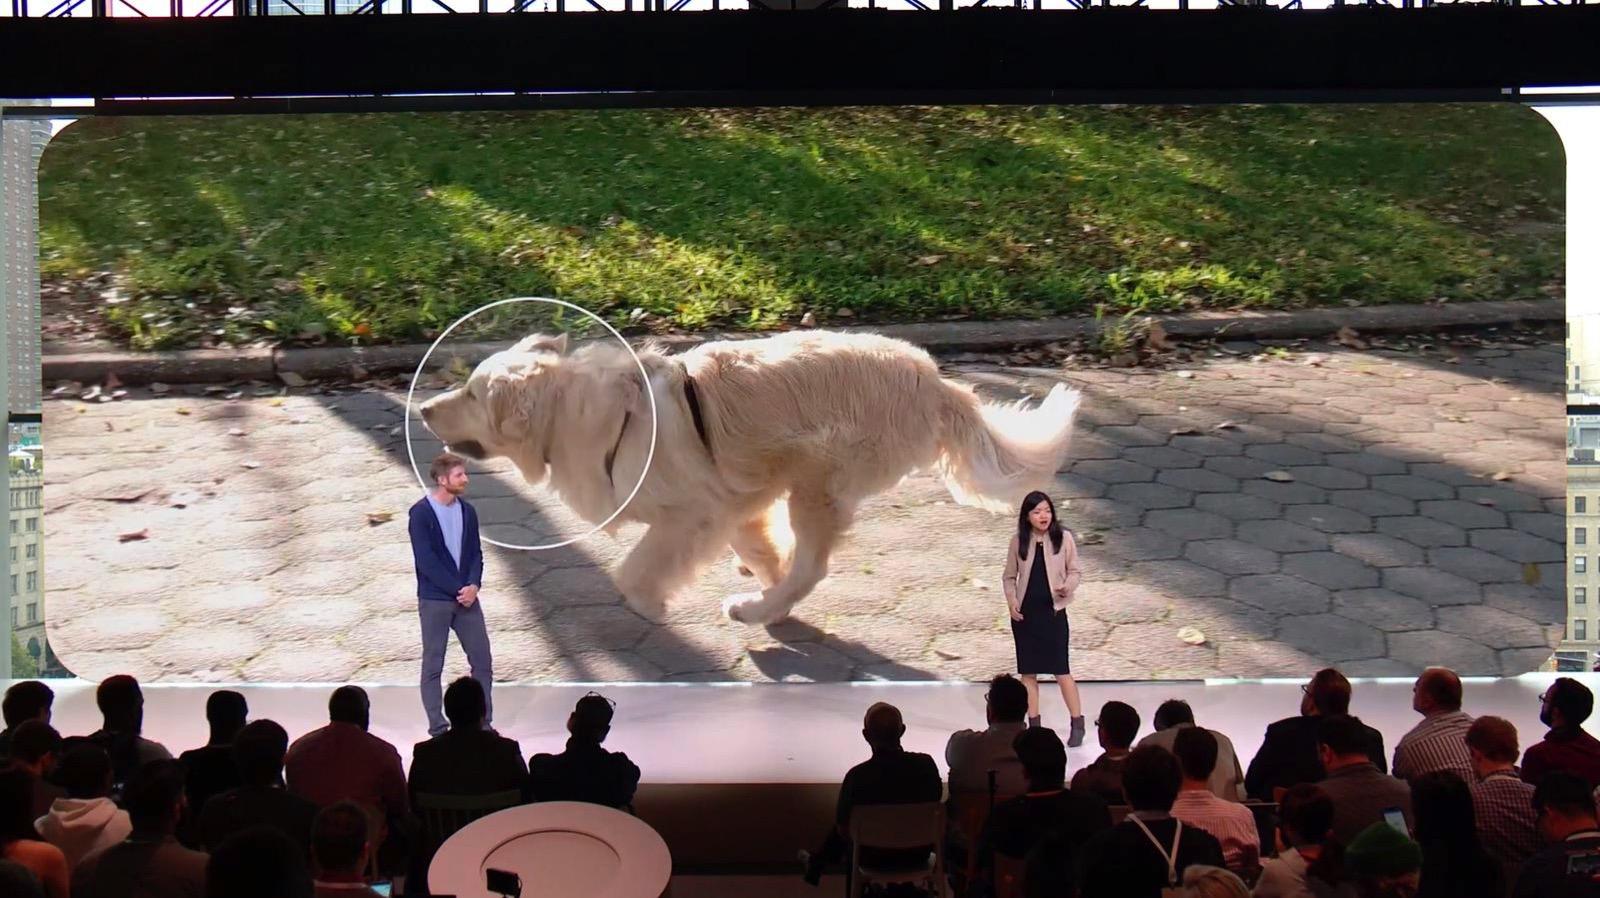 Google-Pixel-3-Camera-Features-11.jpg